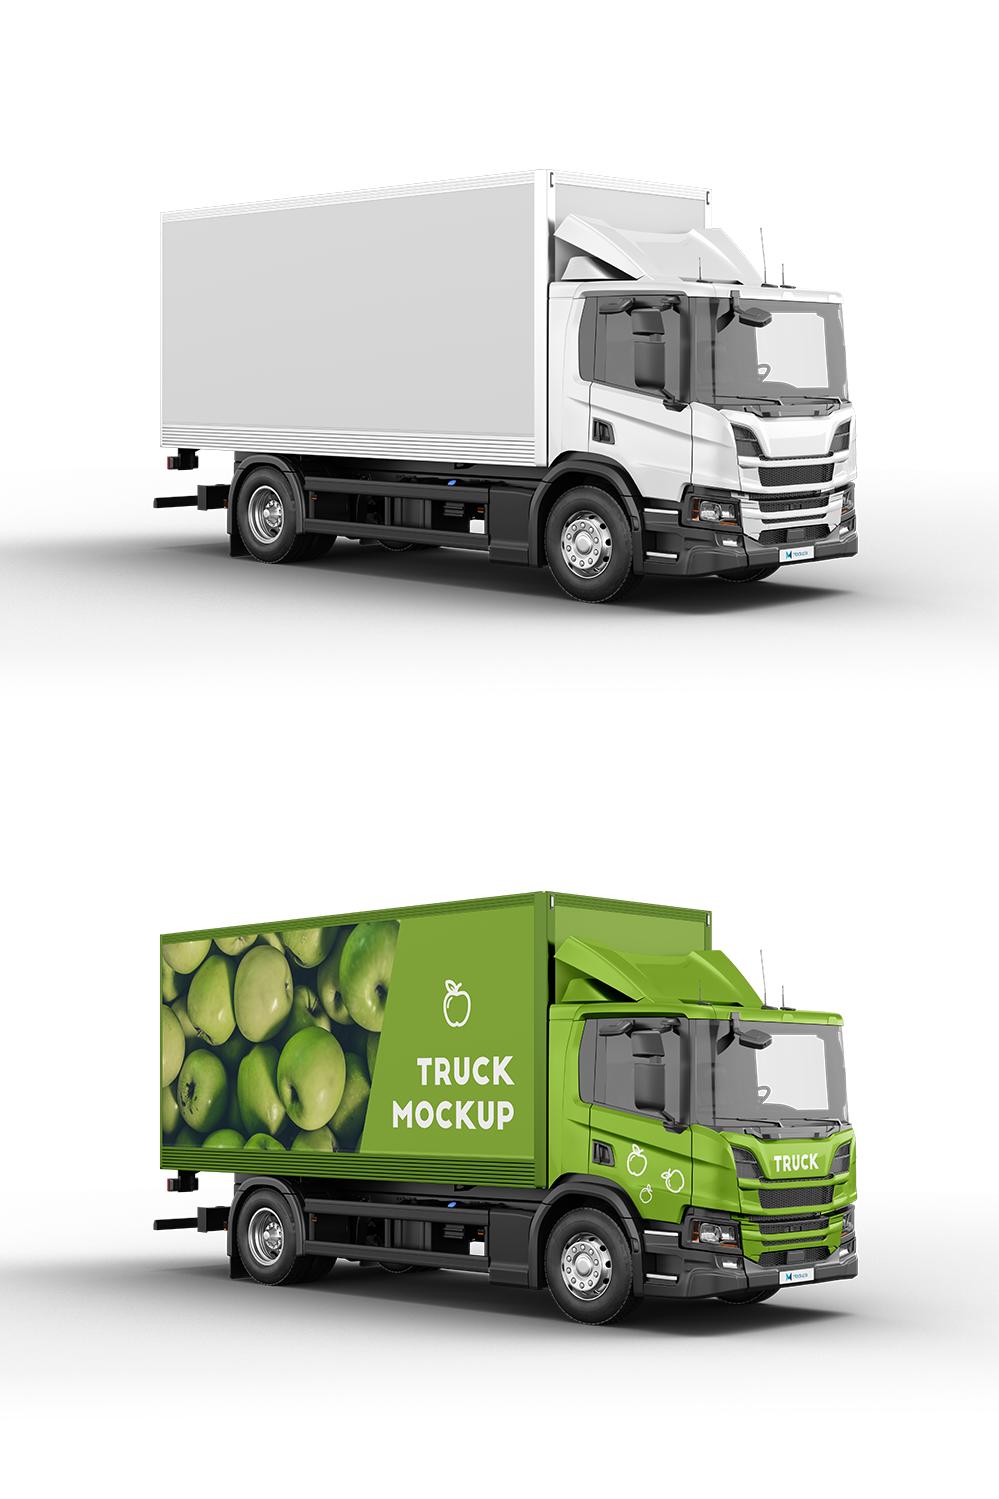 Truck Mockup 3 Trucks Mockup Simple Camera